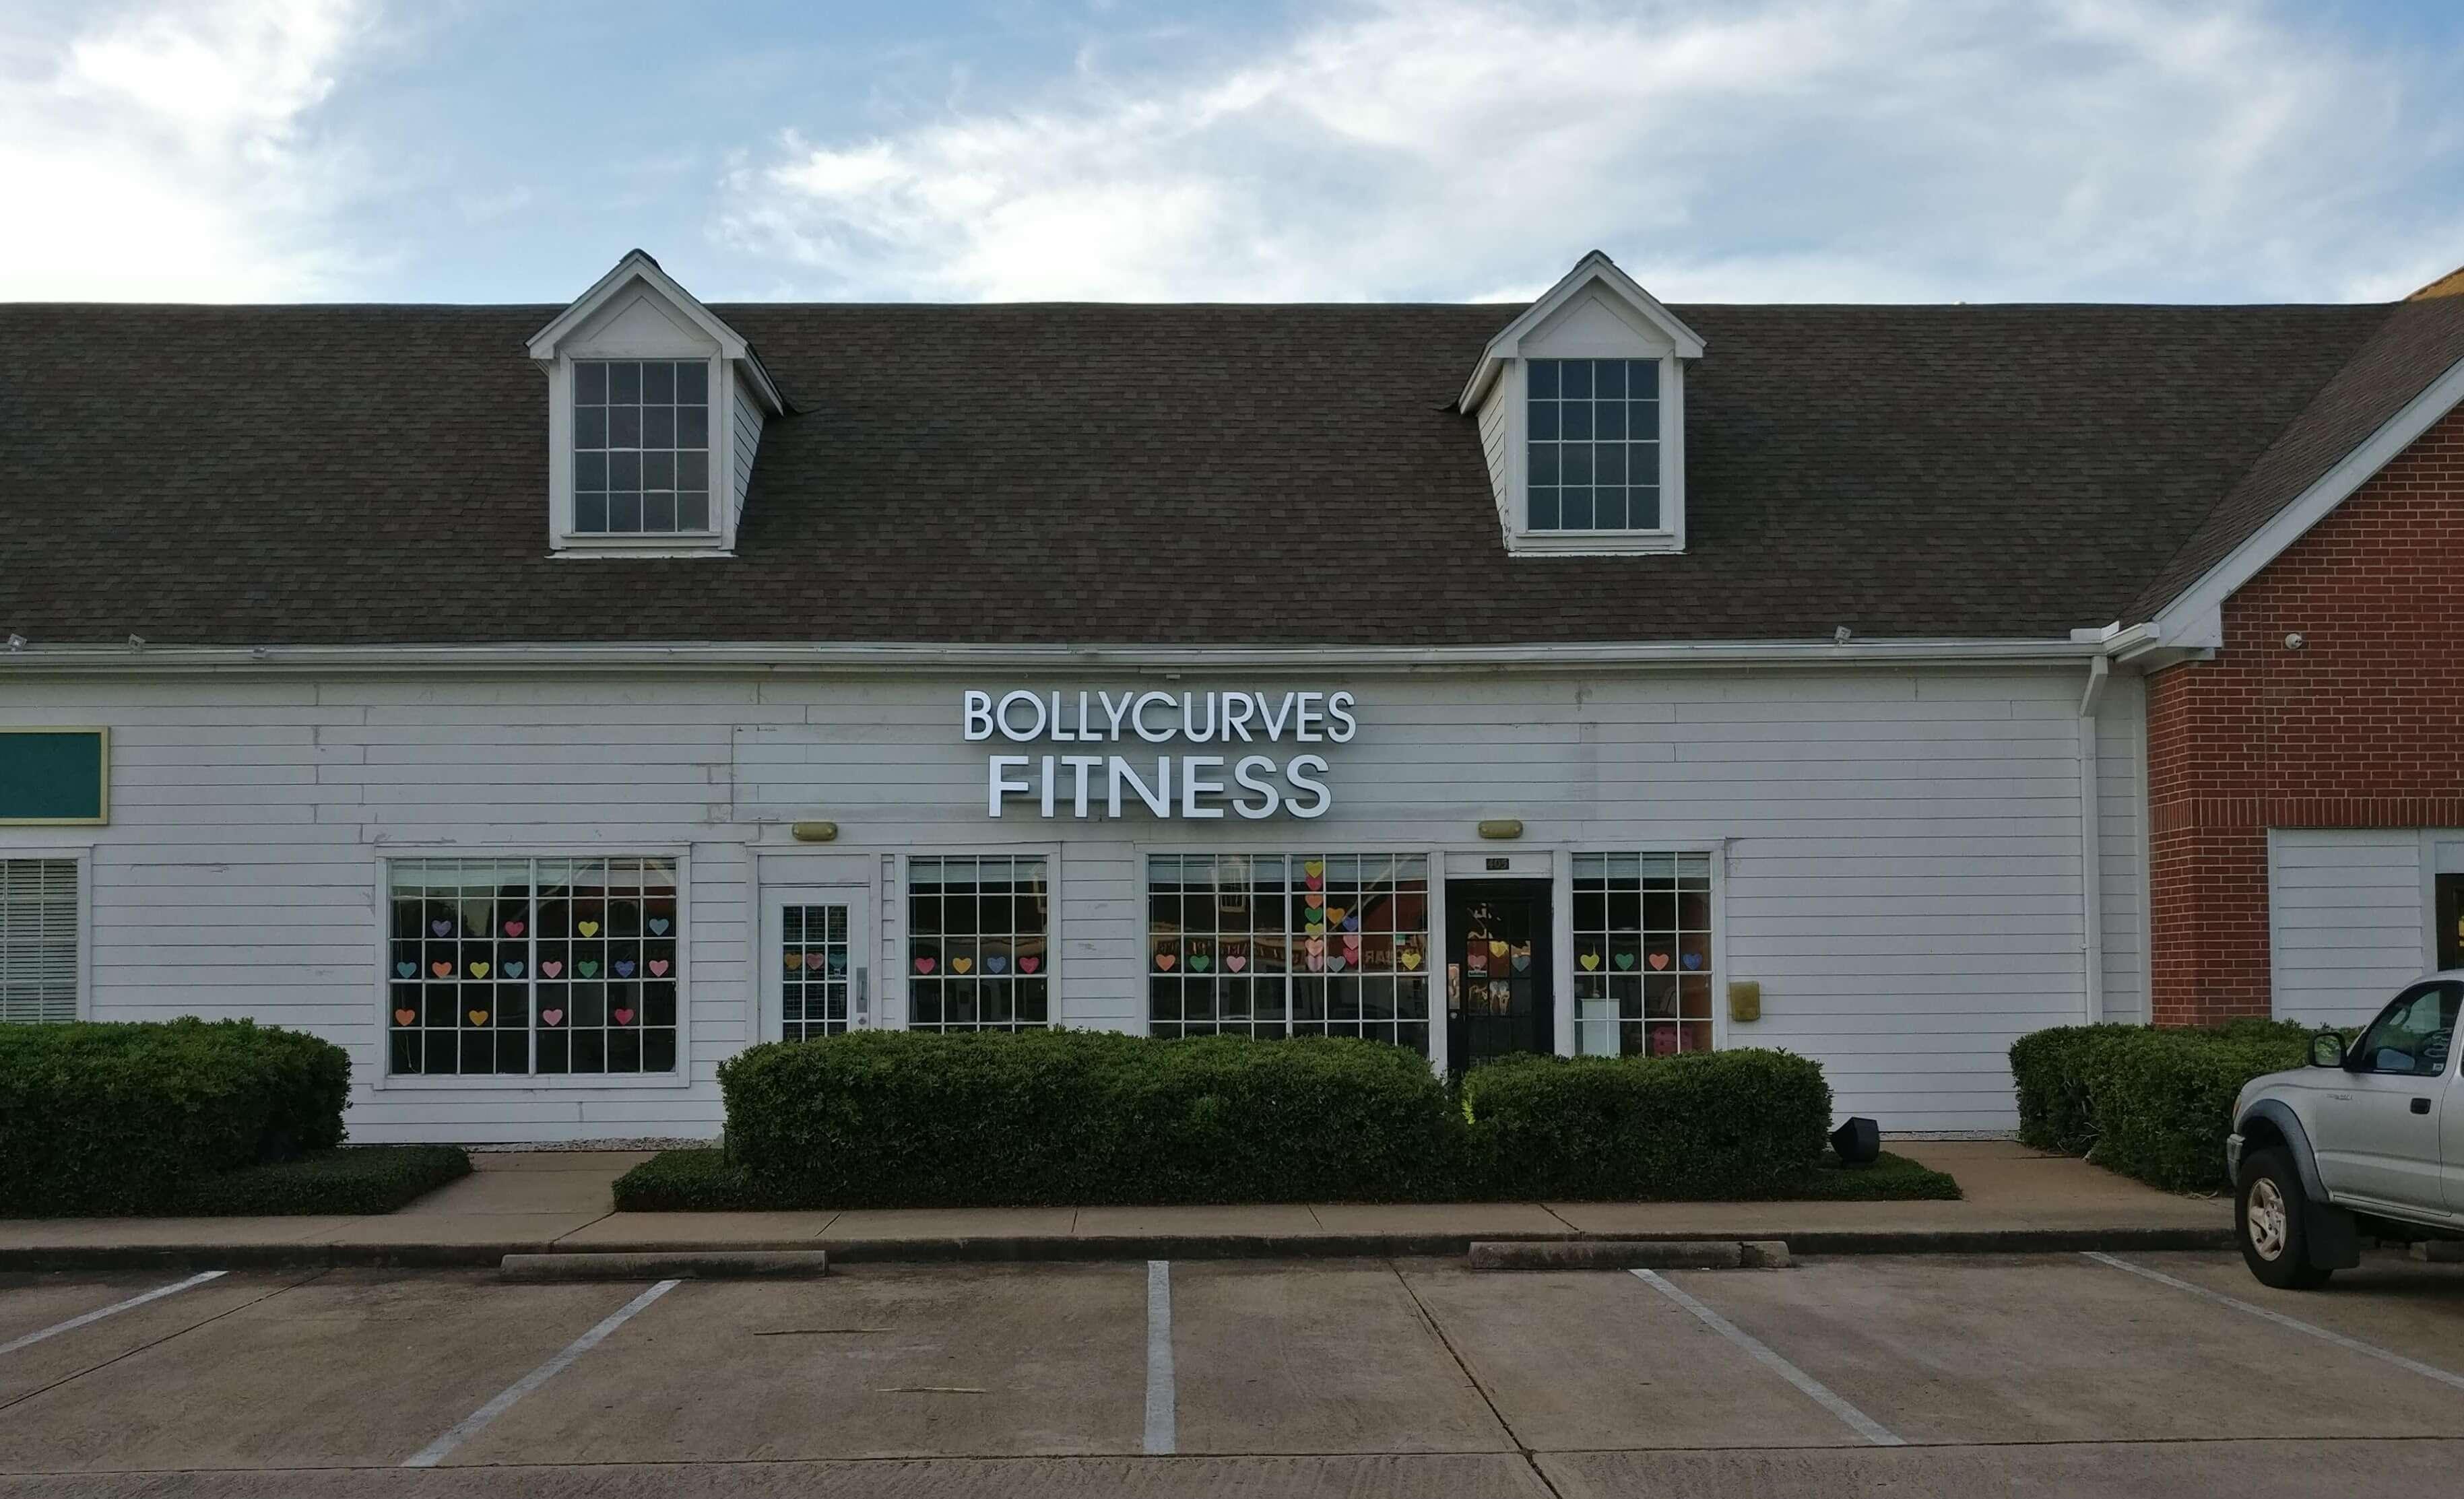 bollycurves dance studio storefront